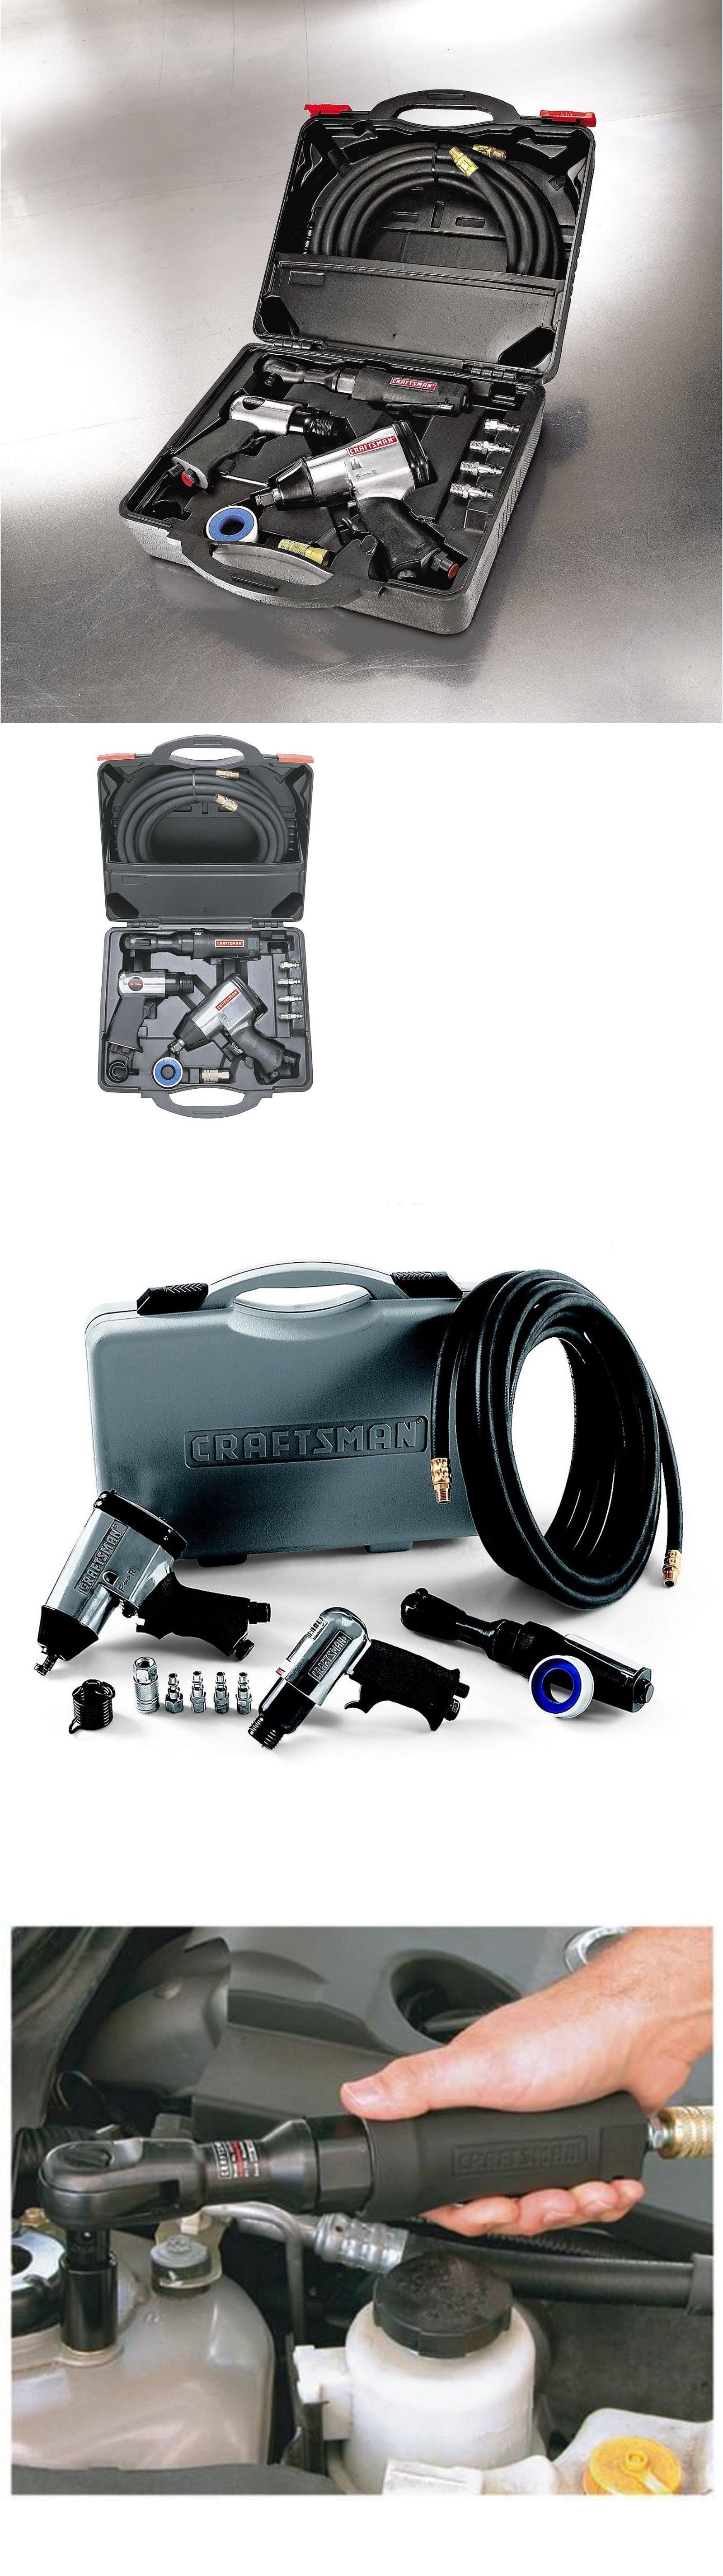 Air Tool Sets 159927 New Craftsman 10 Pc. Air Tool Set